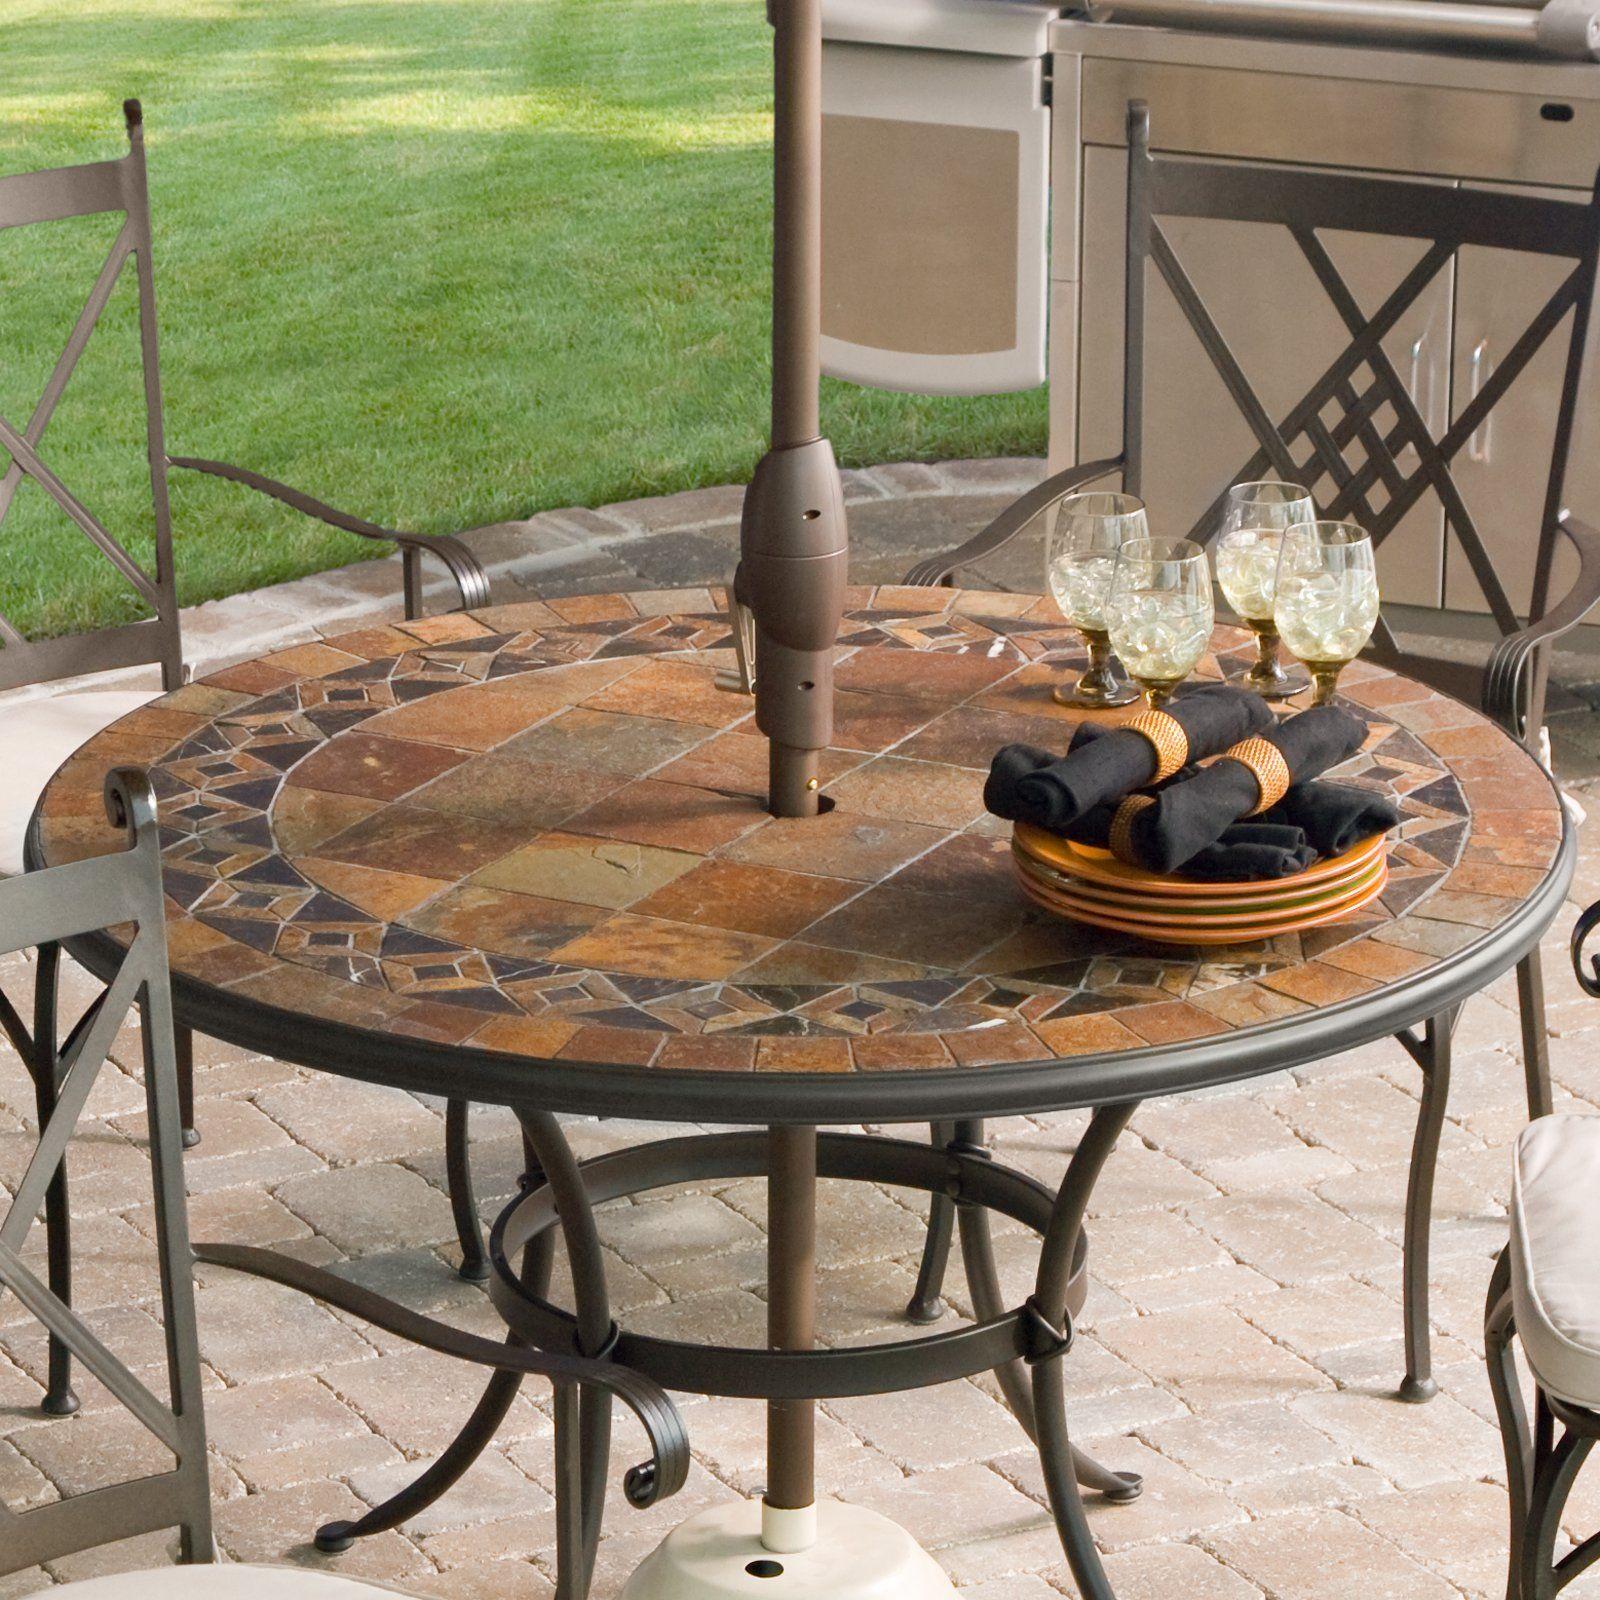 48 inch round mosaic patio dining set